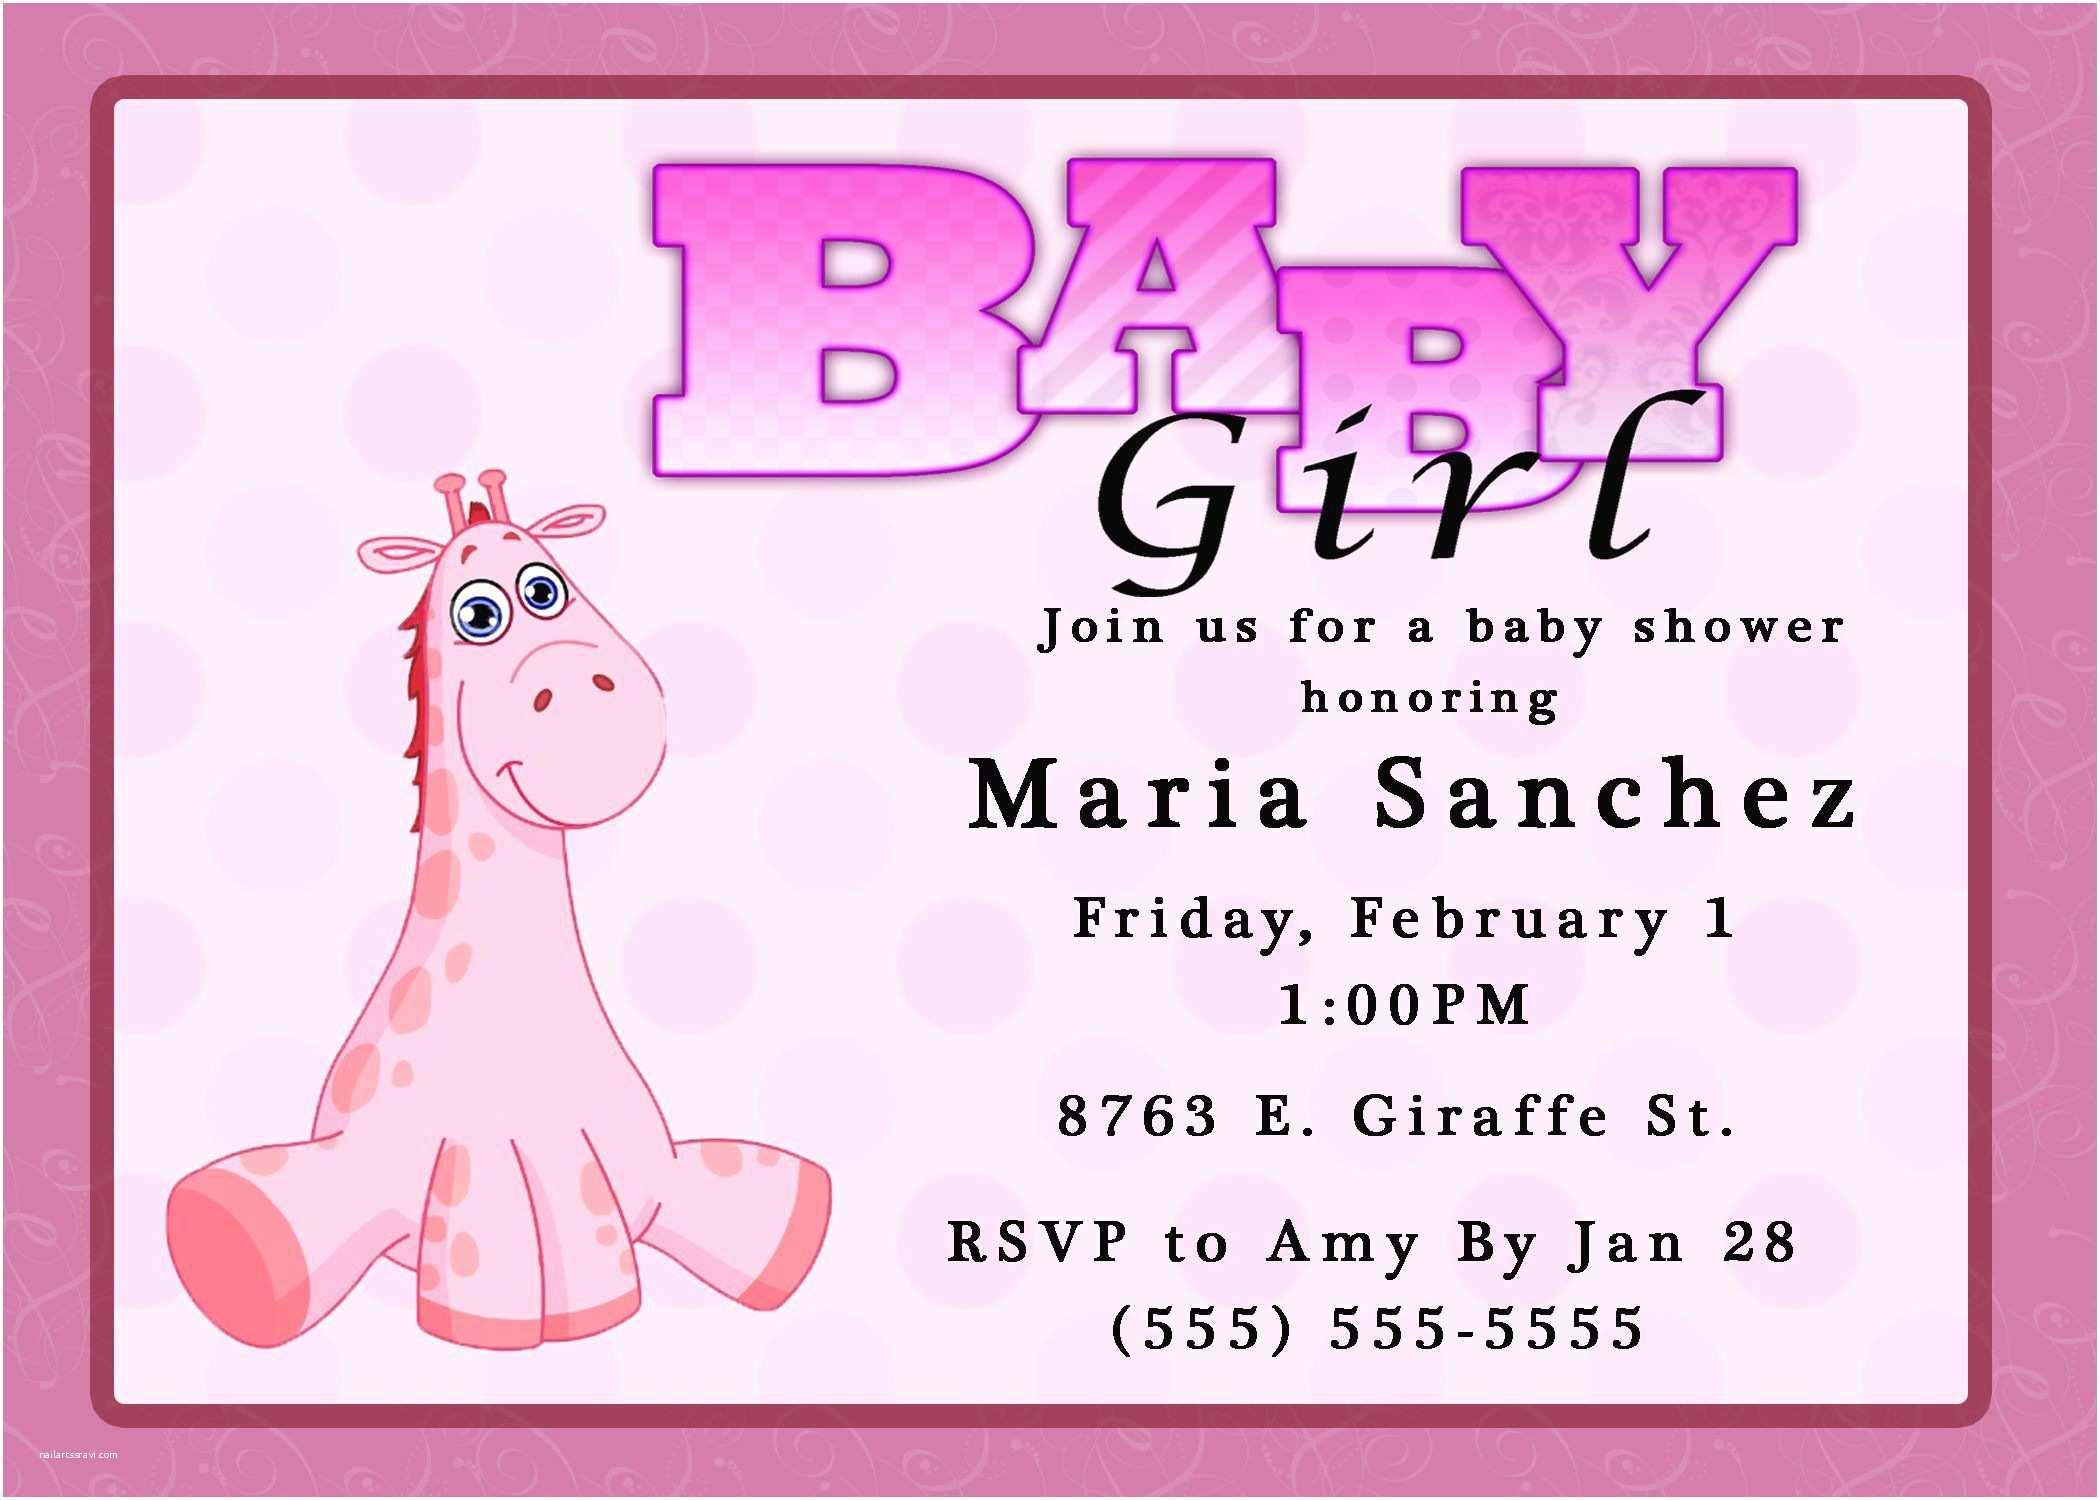 Baby Shower Invitations Girl Baby Shower Invitation Baby Girl Shower Invitations